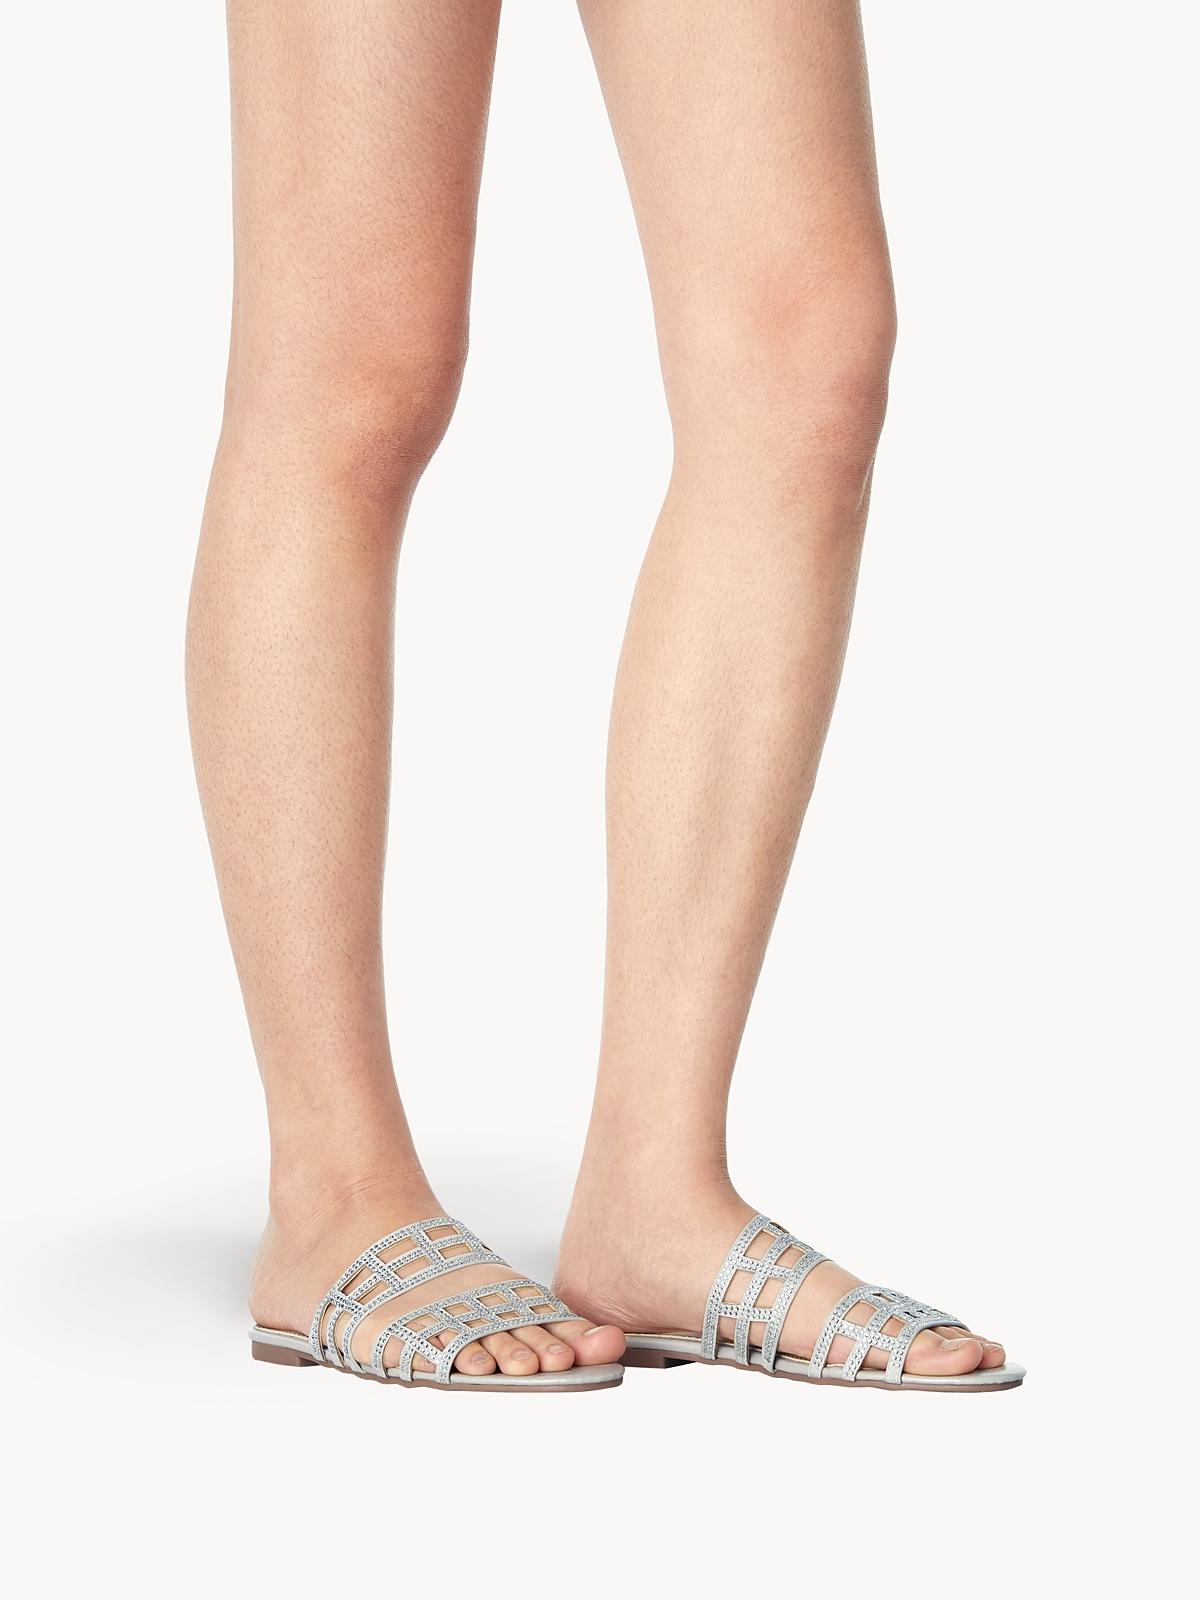 March Shoes West Sandals Silver